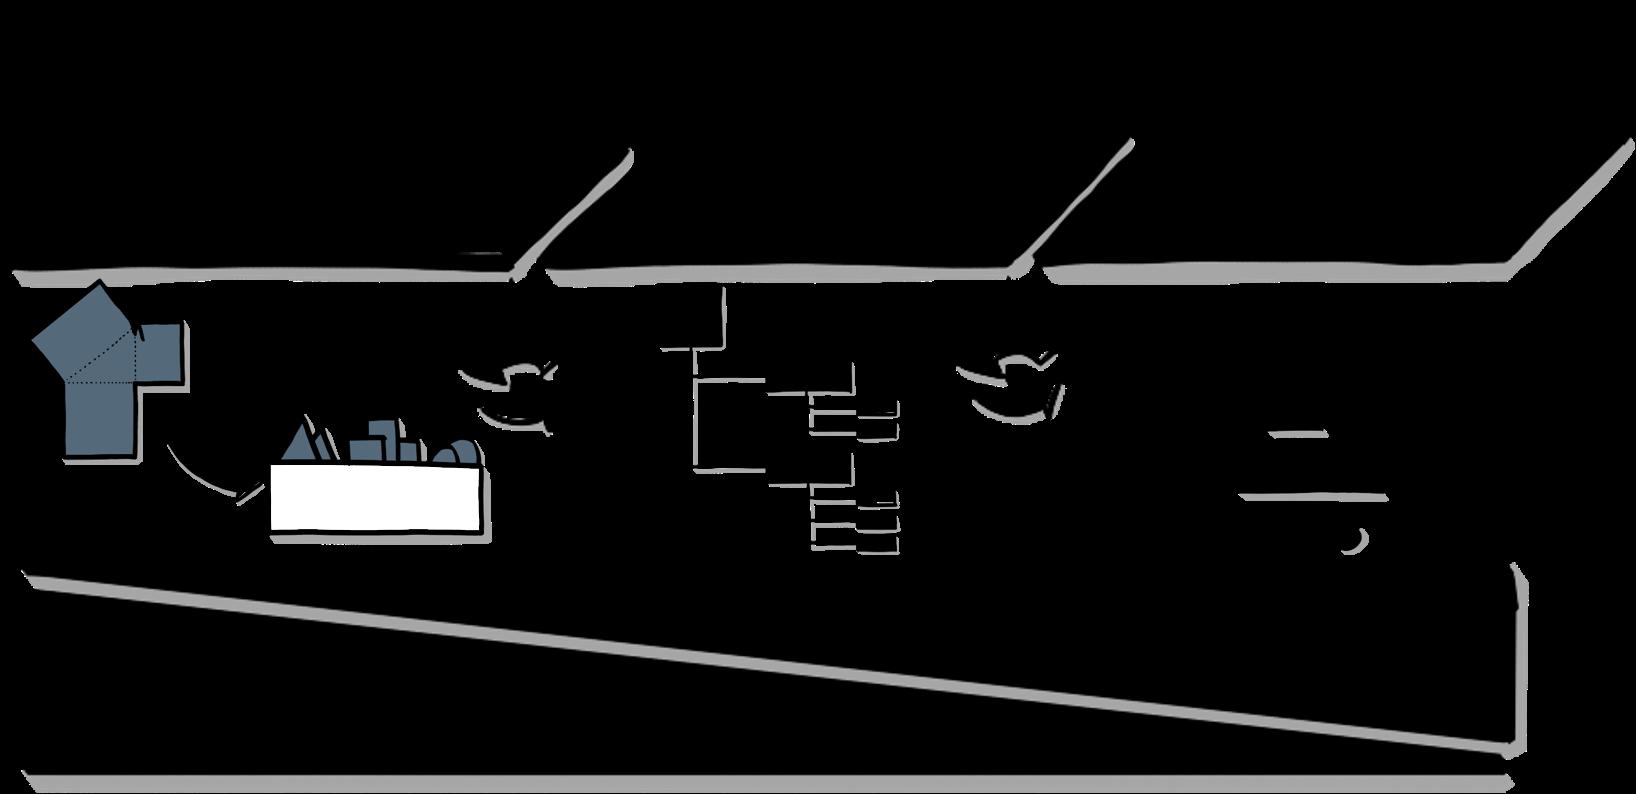 modularization-product-structure-IT